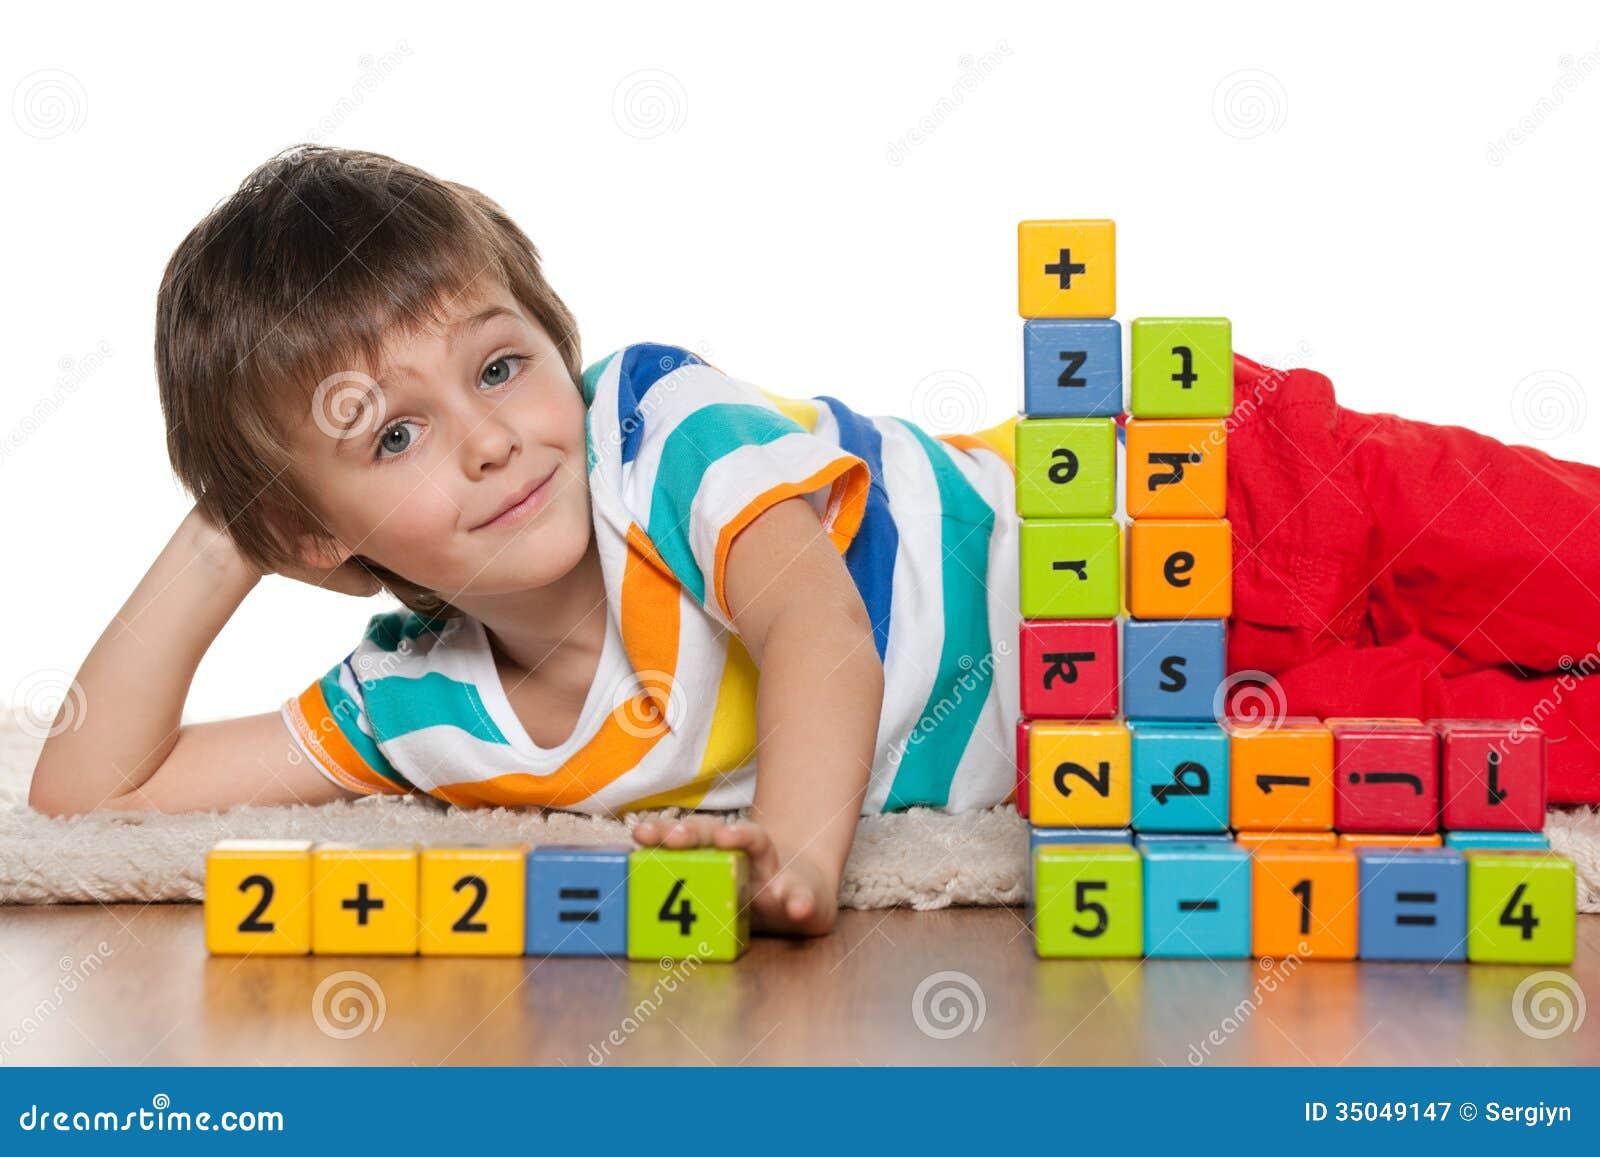 Preschool boy with blocks on the floor